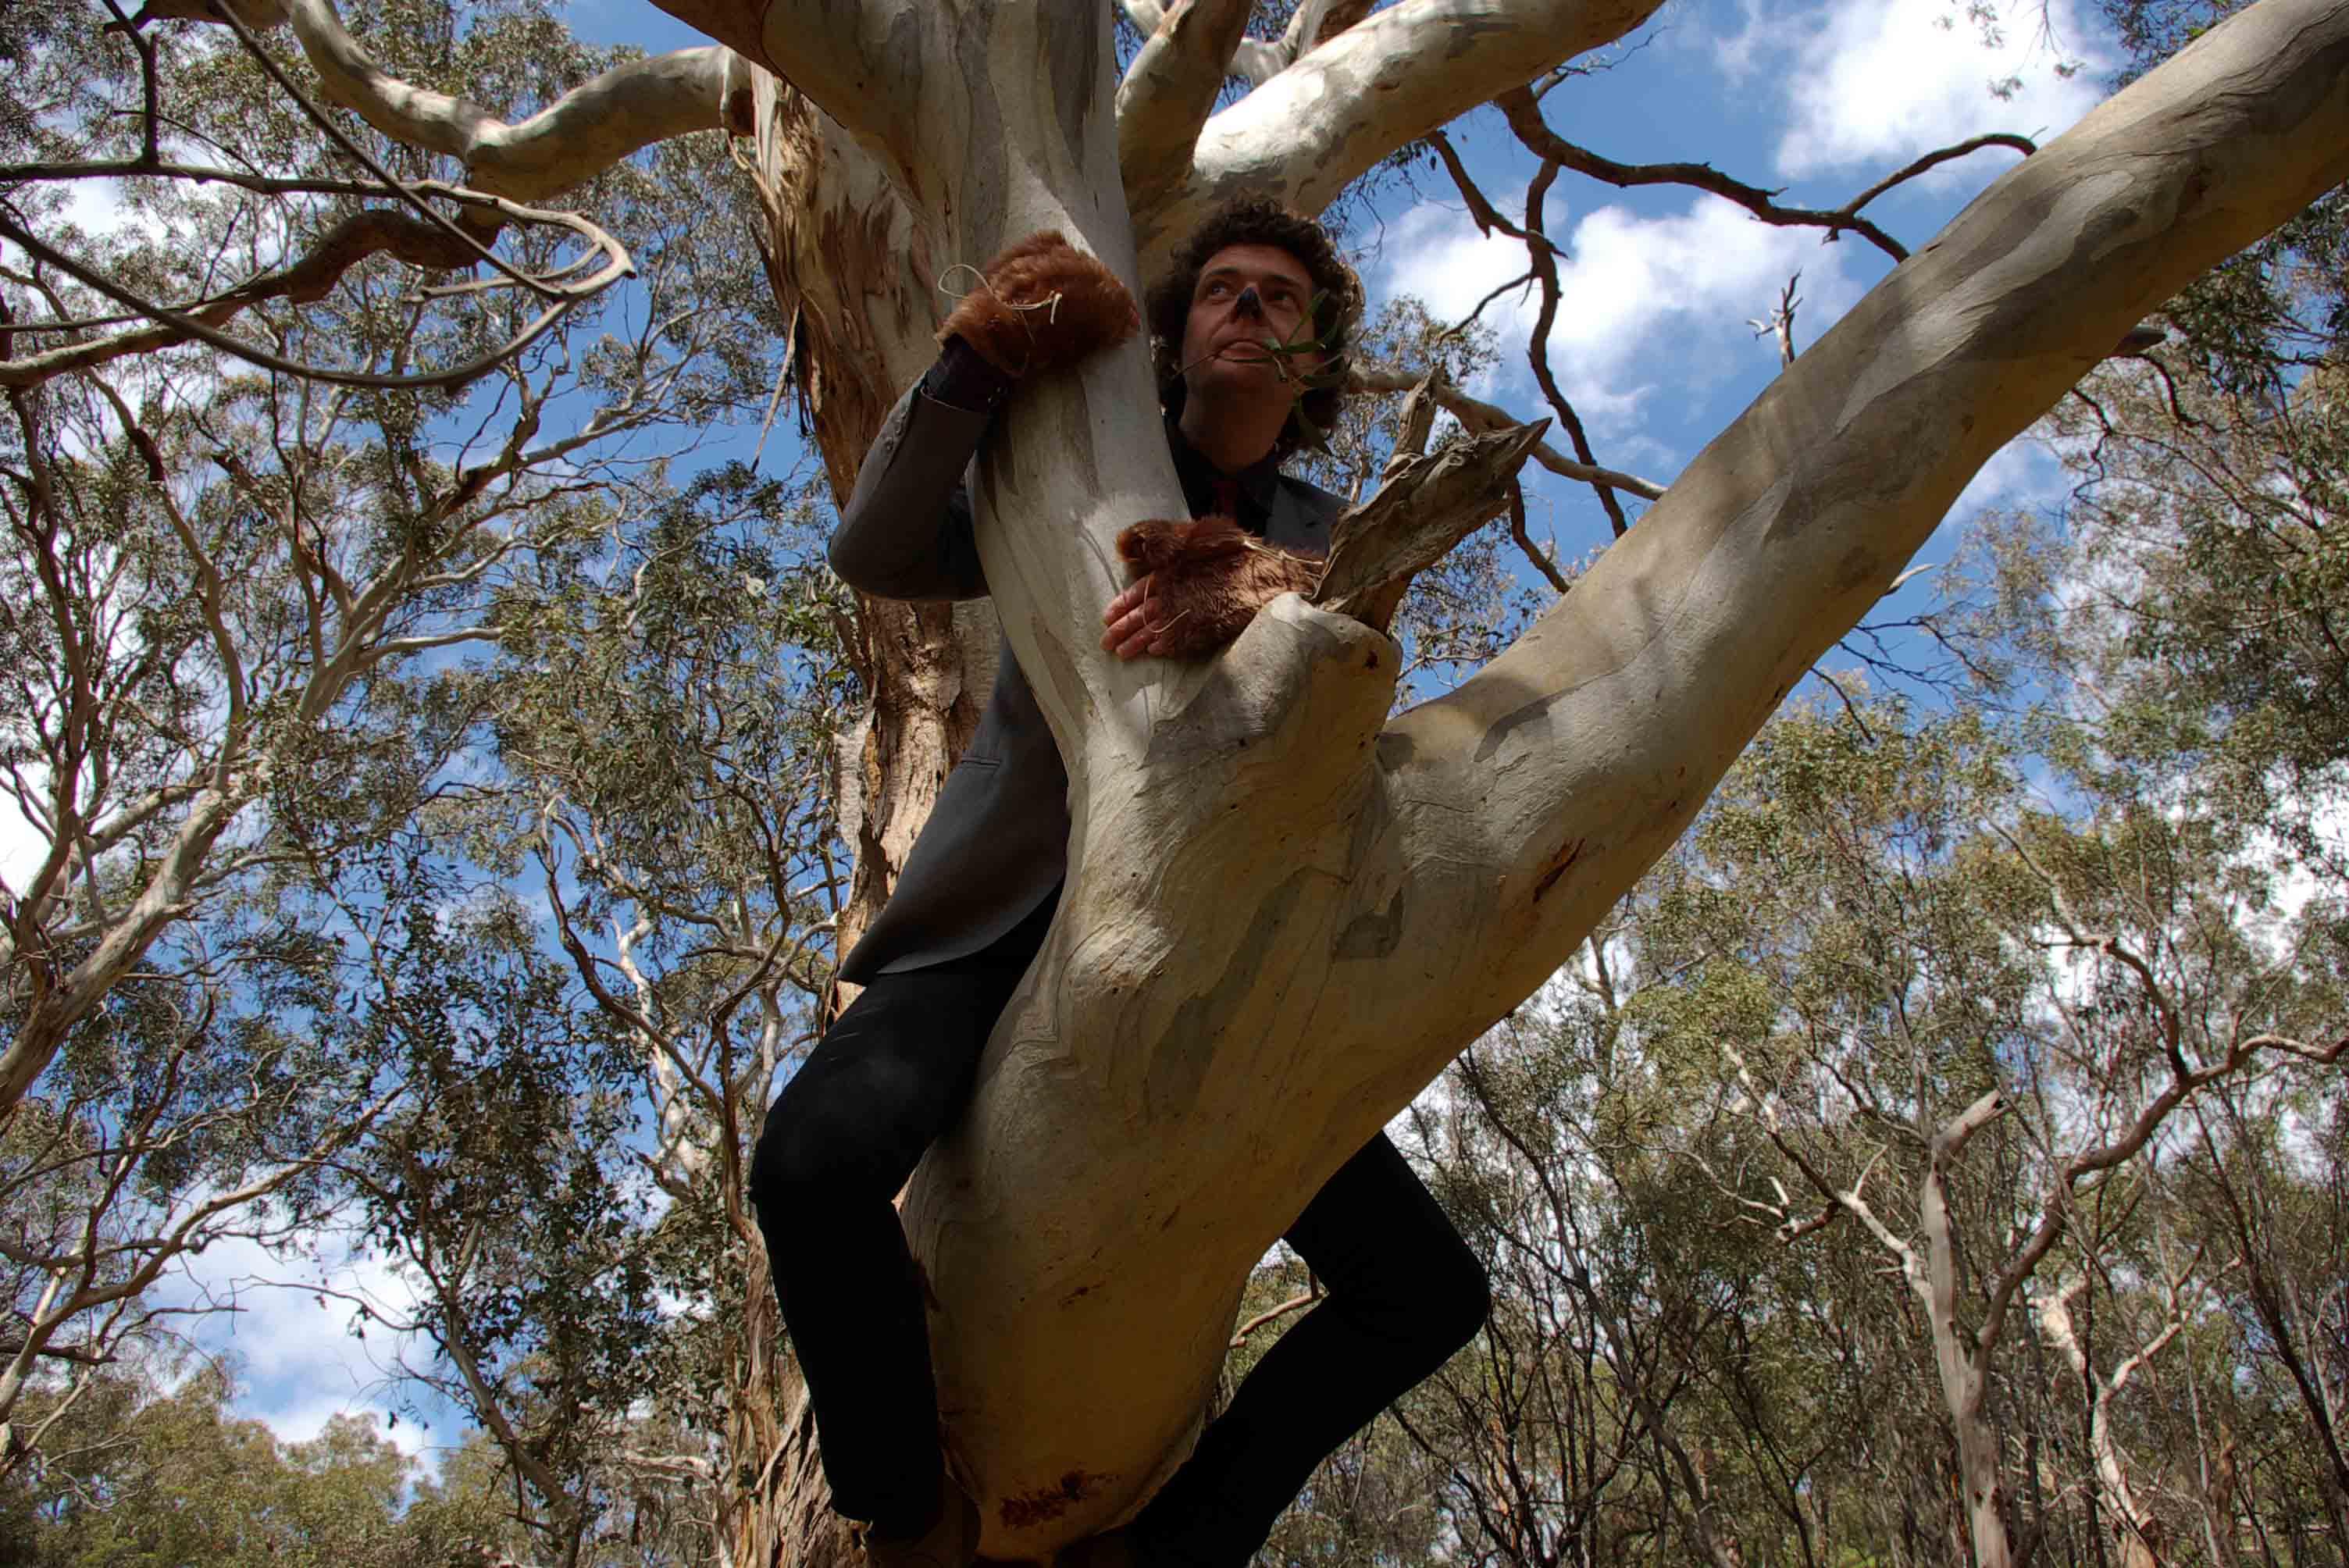 10 Terrifying Facts About The Australian Dropbear